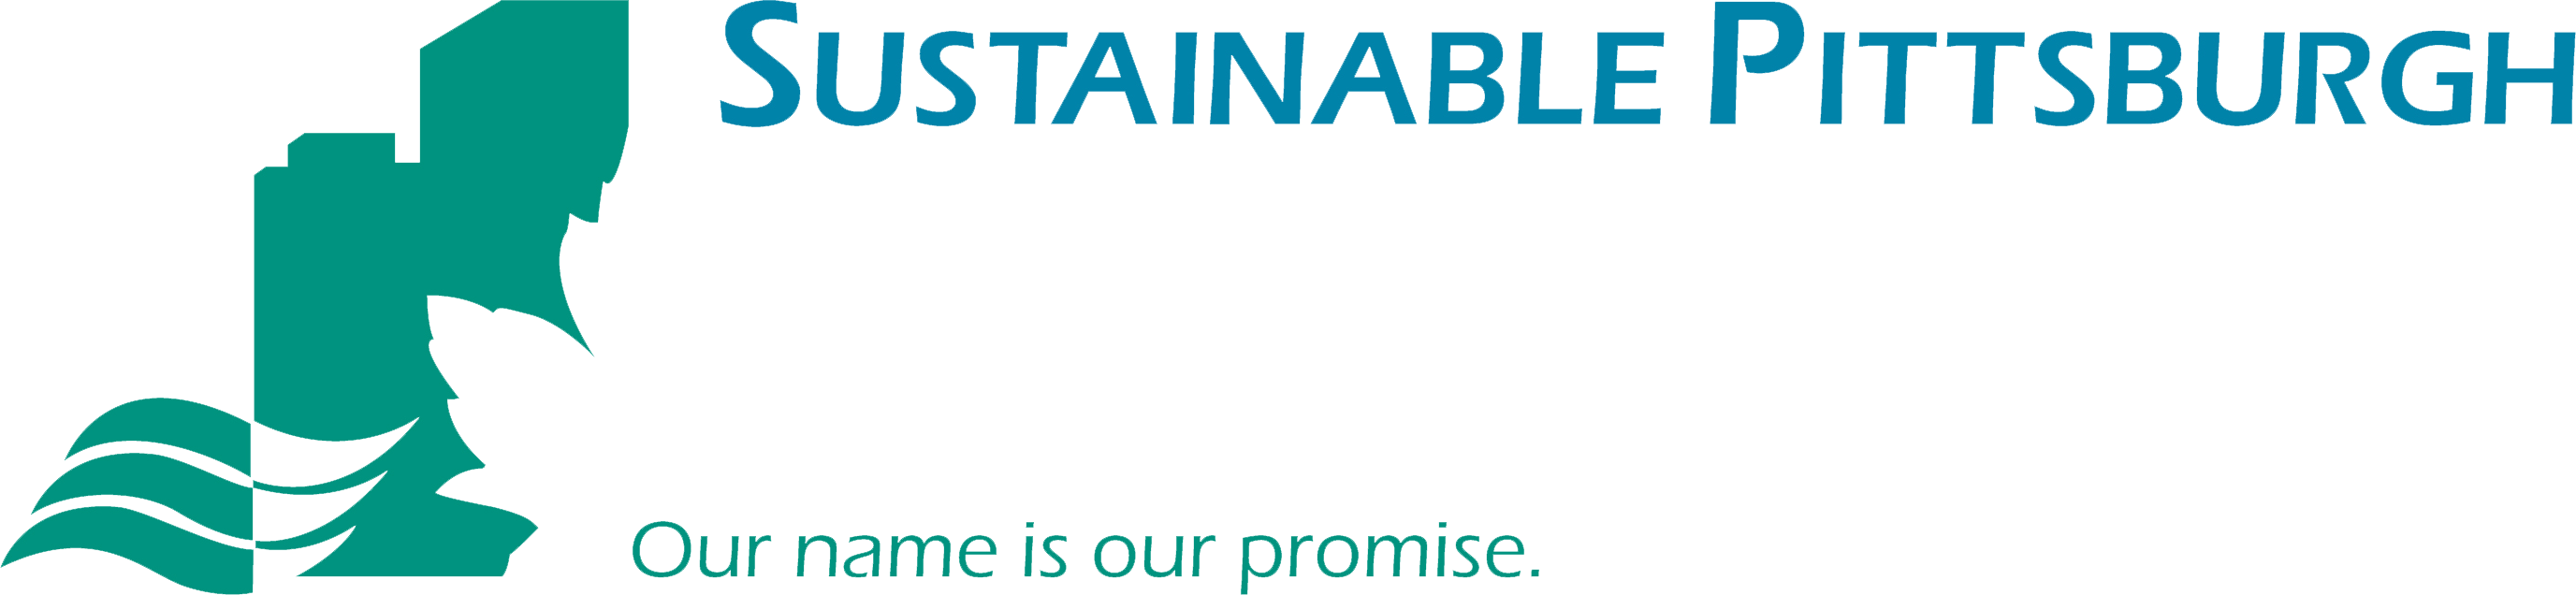 Sustainable Pittsburgh